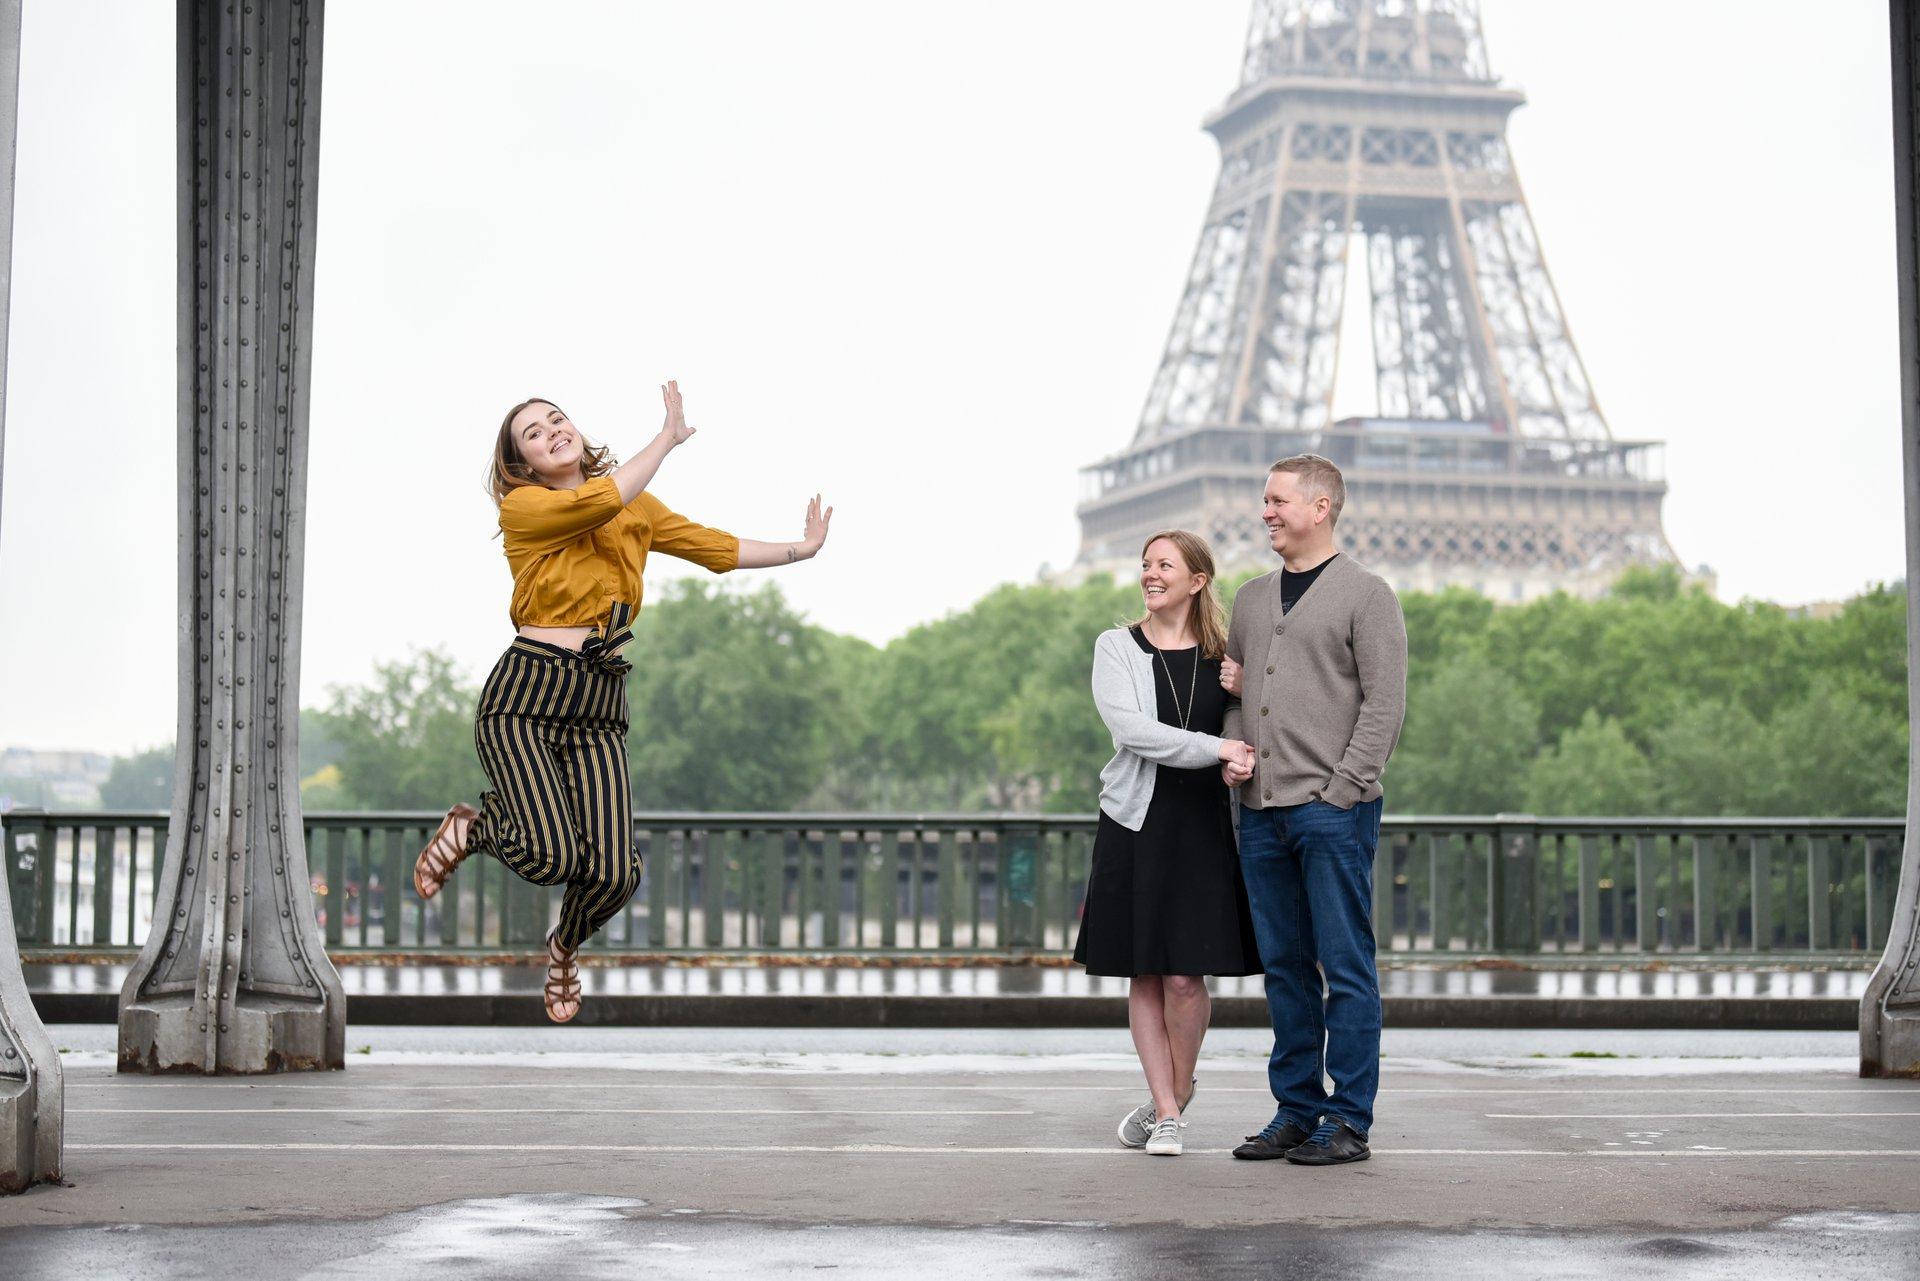 Paris-France-travel-story-Flytographer-1